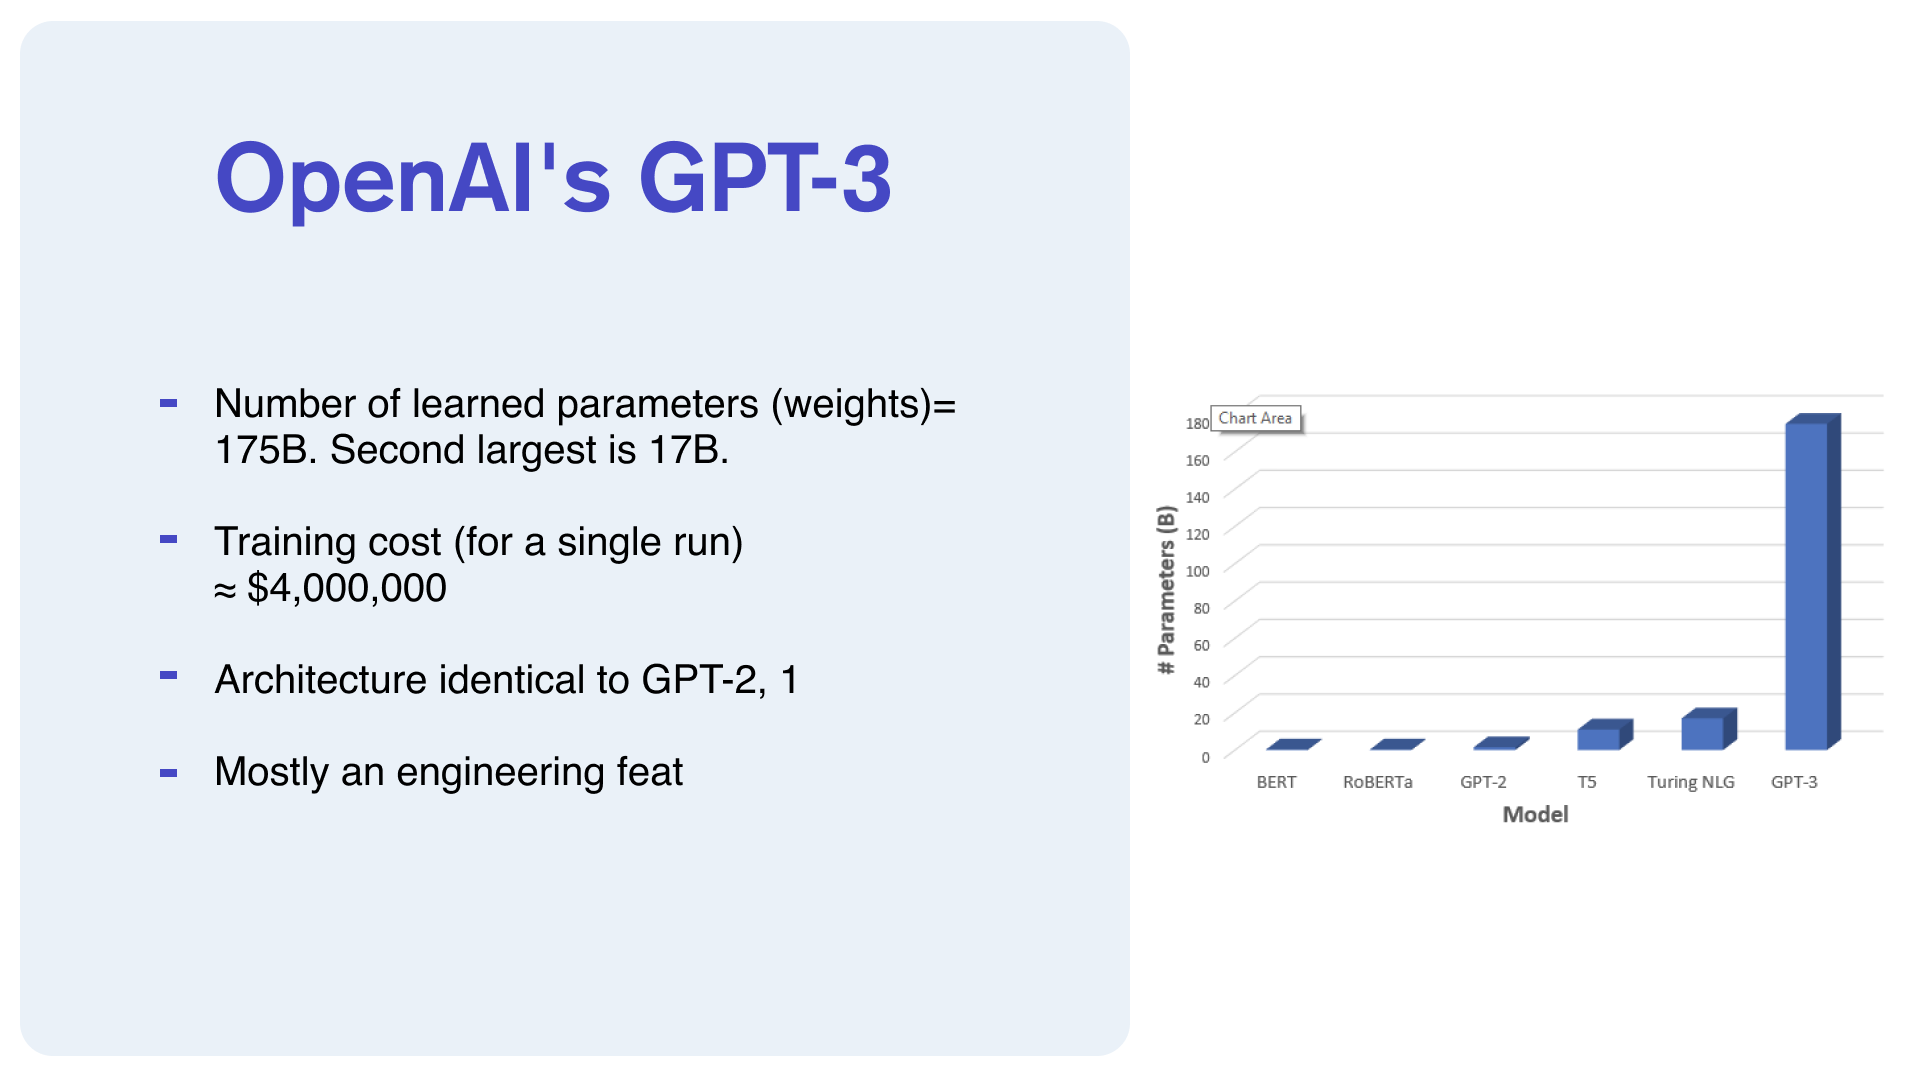 OpenAI's GPT-3